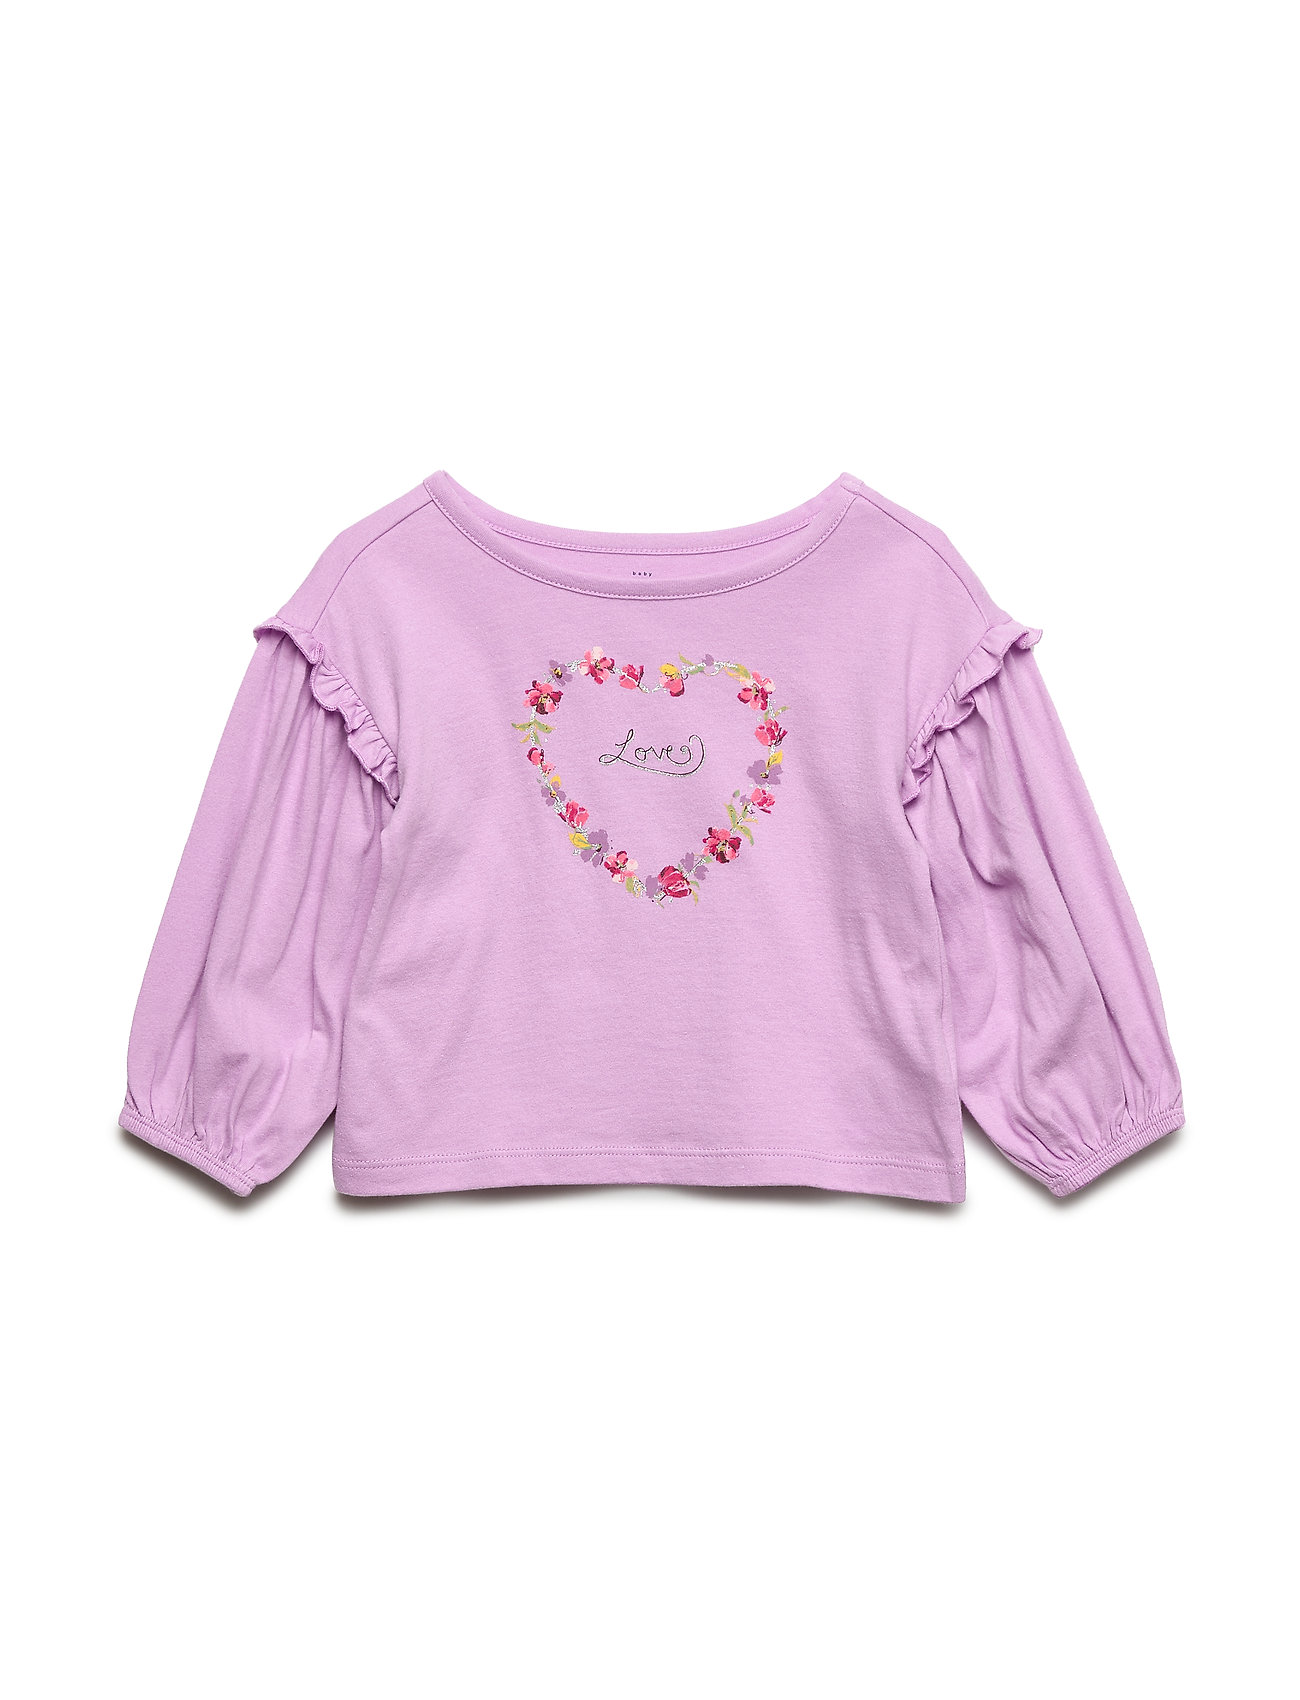 Image of Toddler Ruffle-Sleeve Graphic T-Shirt Langærmet T-shirt Lilla GAP (3230588755)